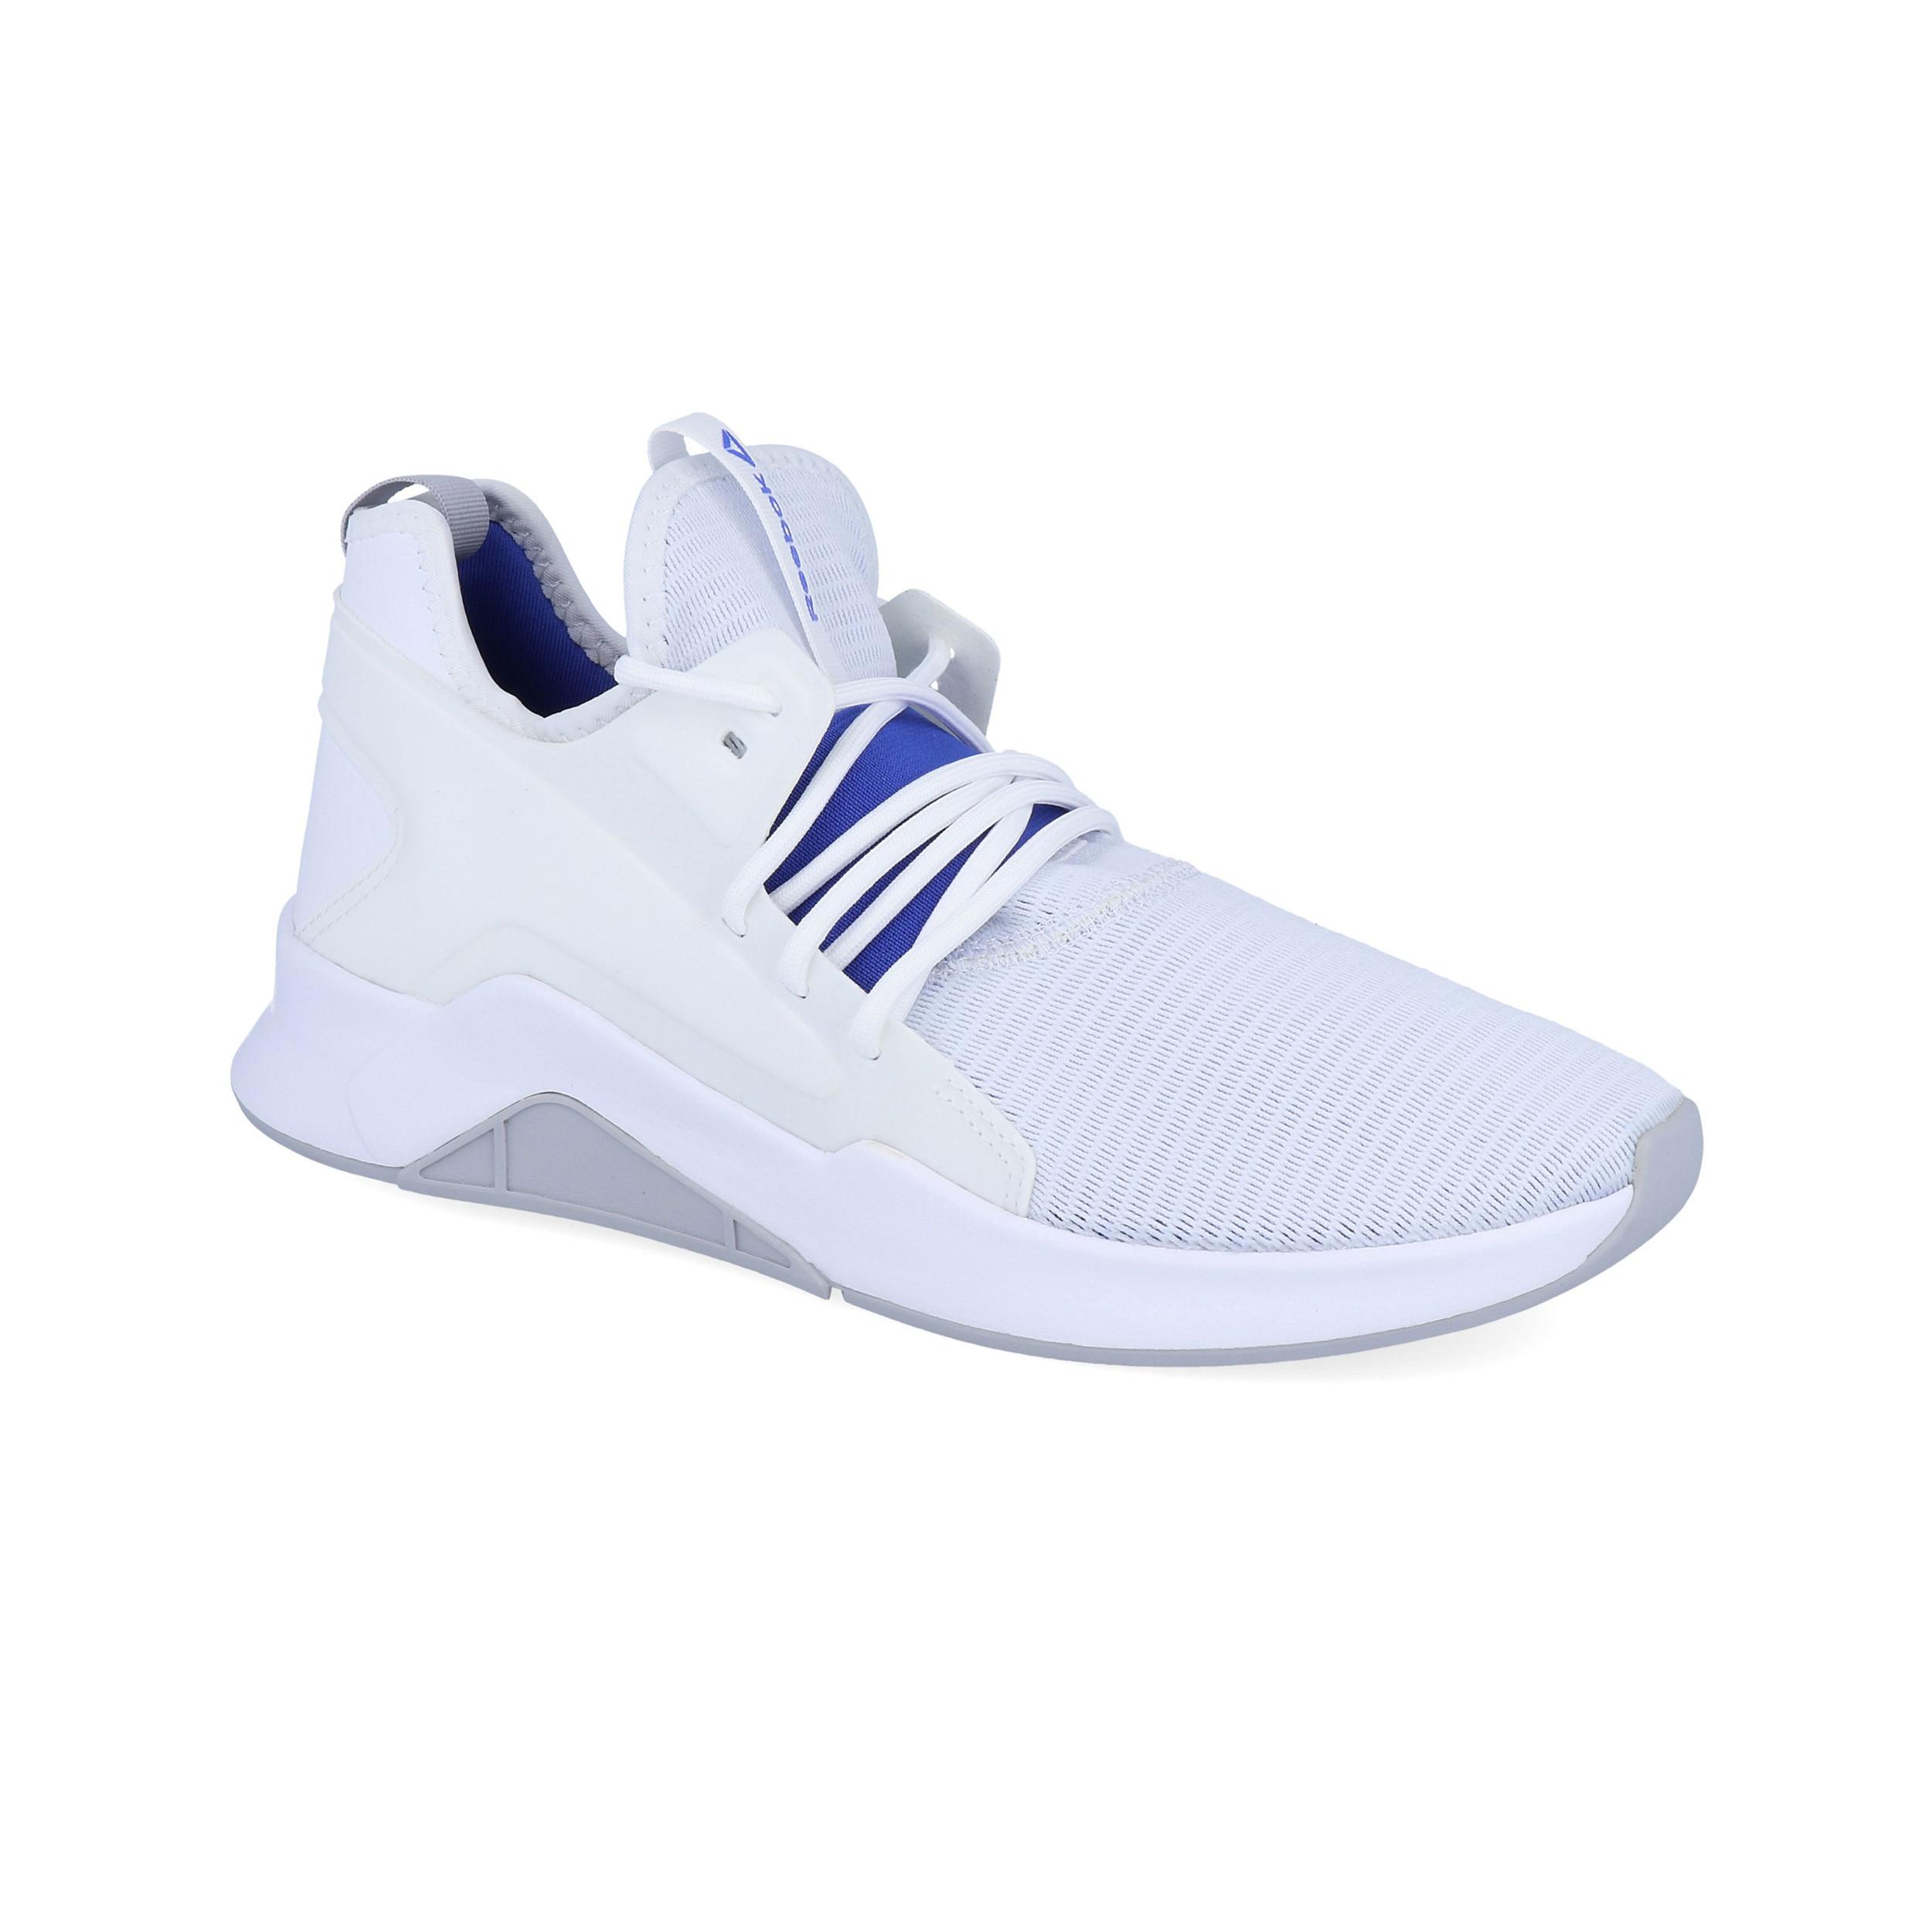 Détails sur Reebok Femme Guresu 2.0 Entraînement Baskets De Sport Chaussures Gym Blanc Bleu